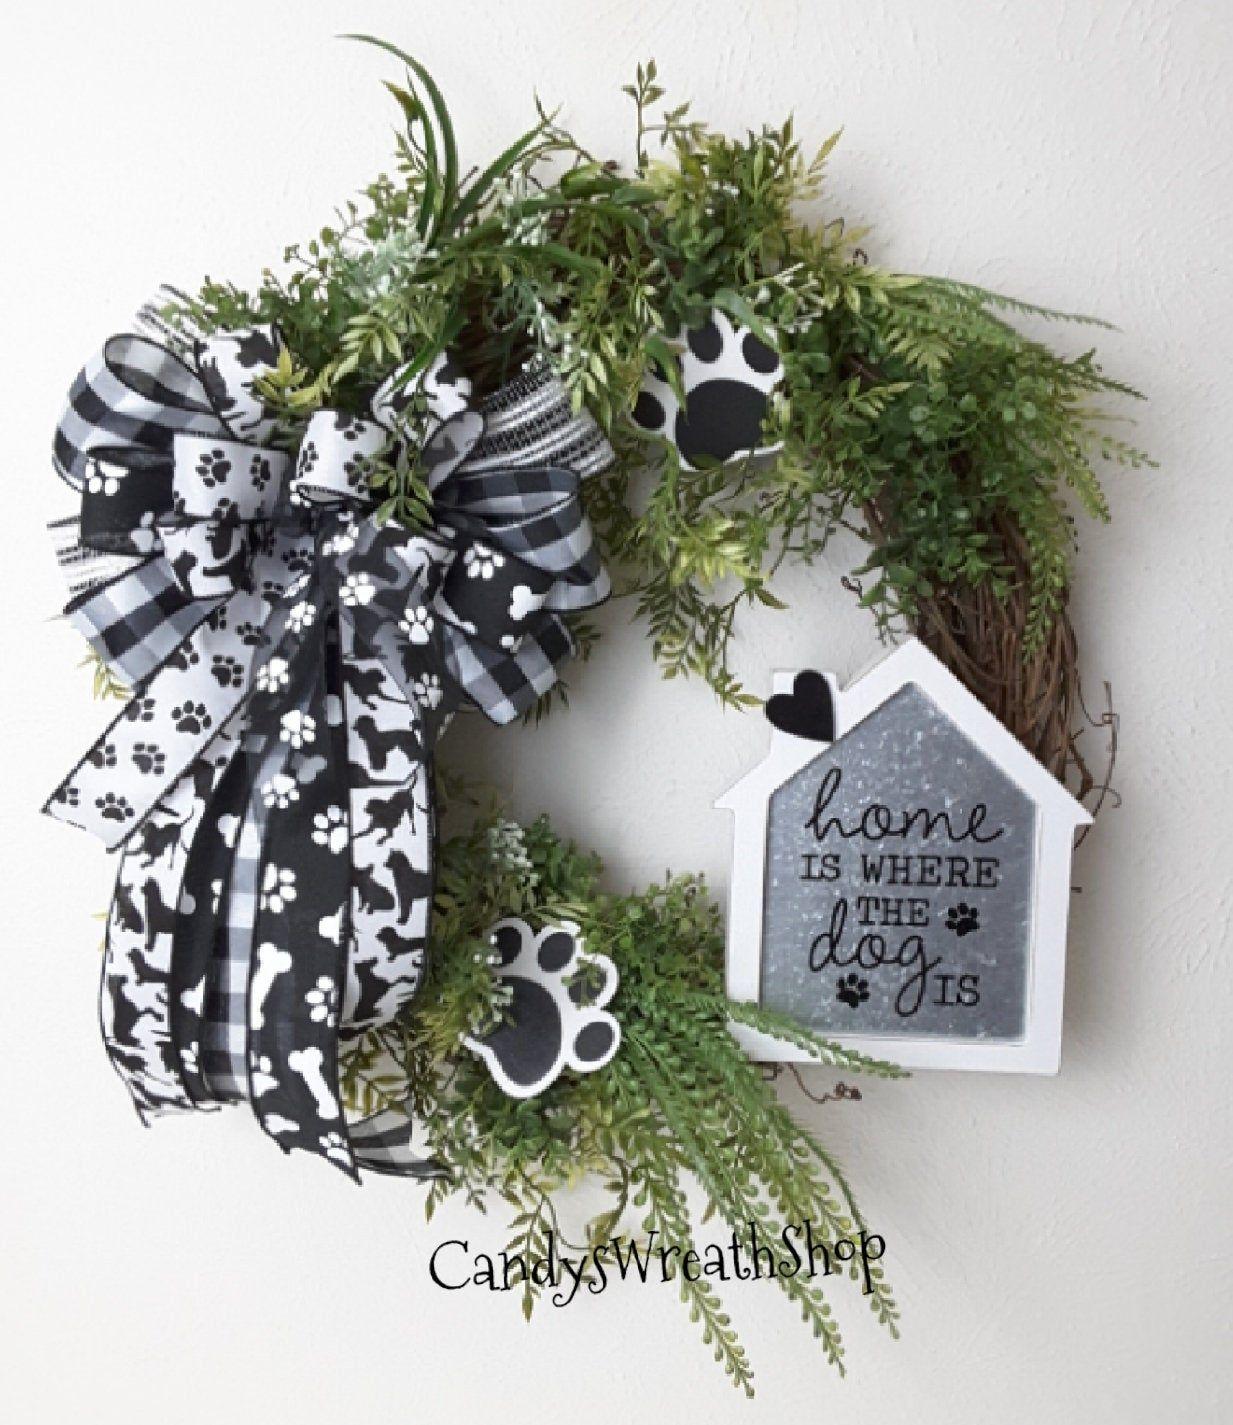 Photo of Dog Wreath, Dog Lovers Wreath, Pet Wreath, Grapevine Wreath, Paw Print Wreath, Buffalo Plaid, Dog Grapevine Wreath, Pet Decor, Paw Prints